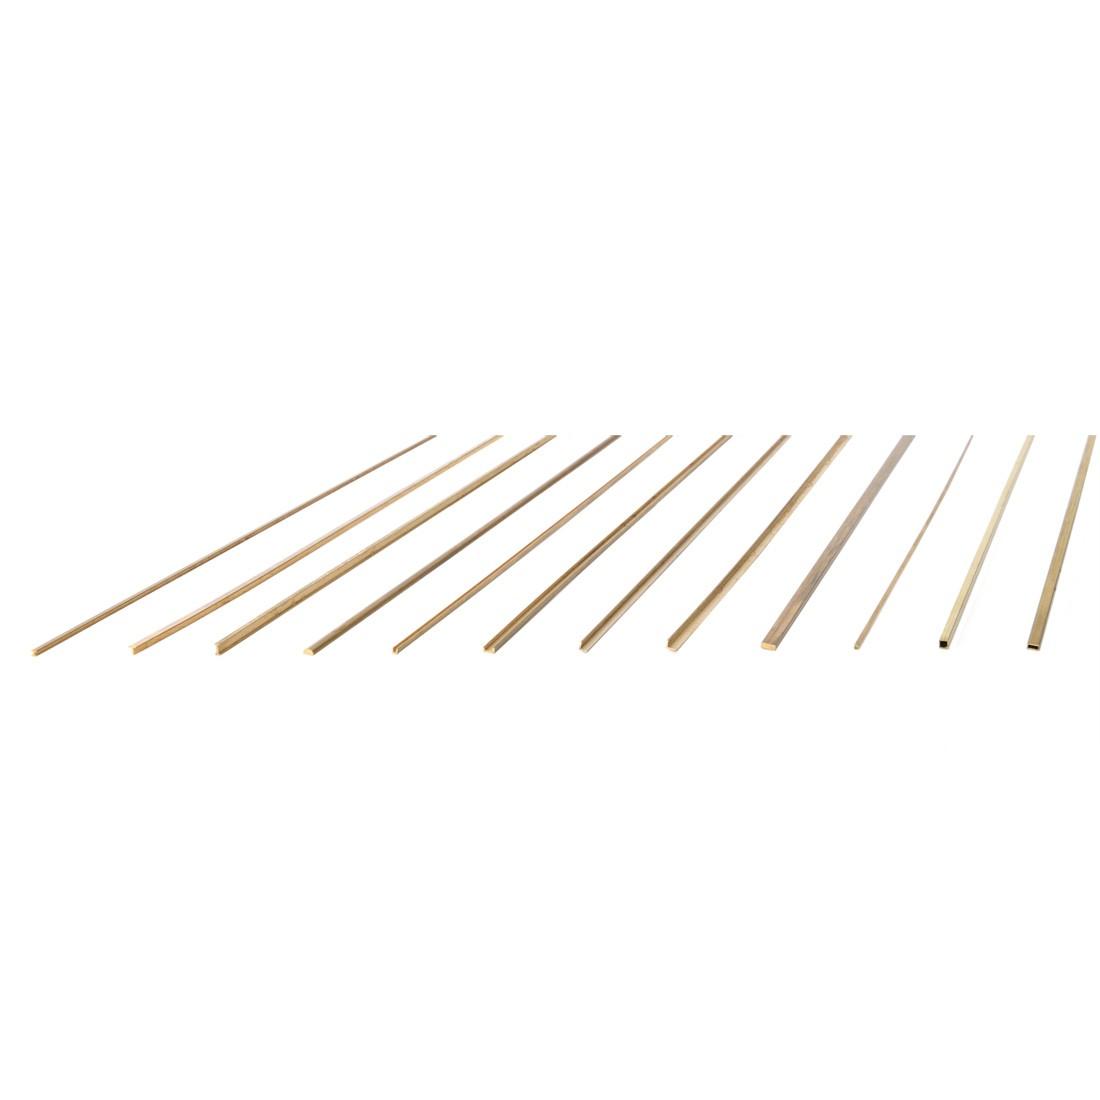 Microprofilati Ottone mm. 2x2x500 sez. H